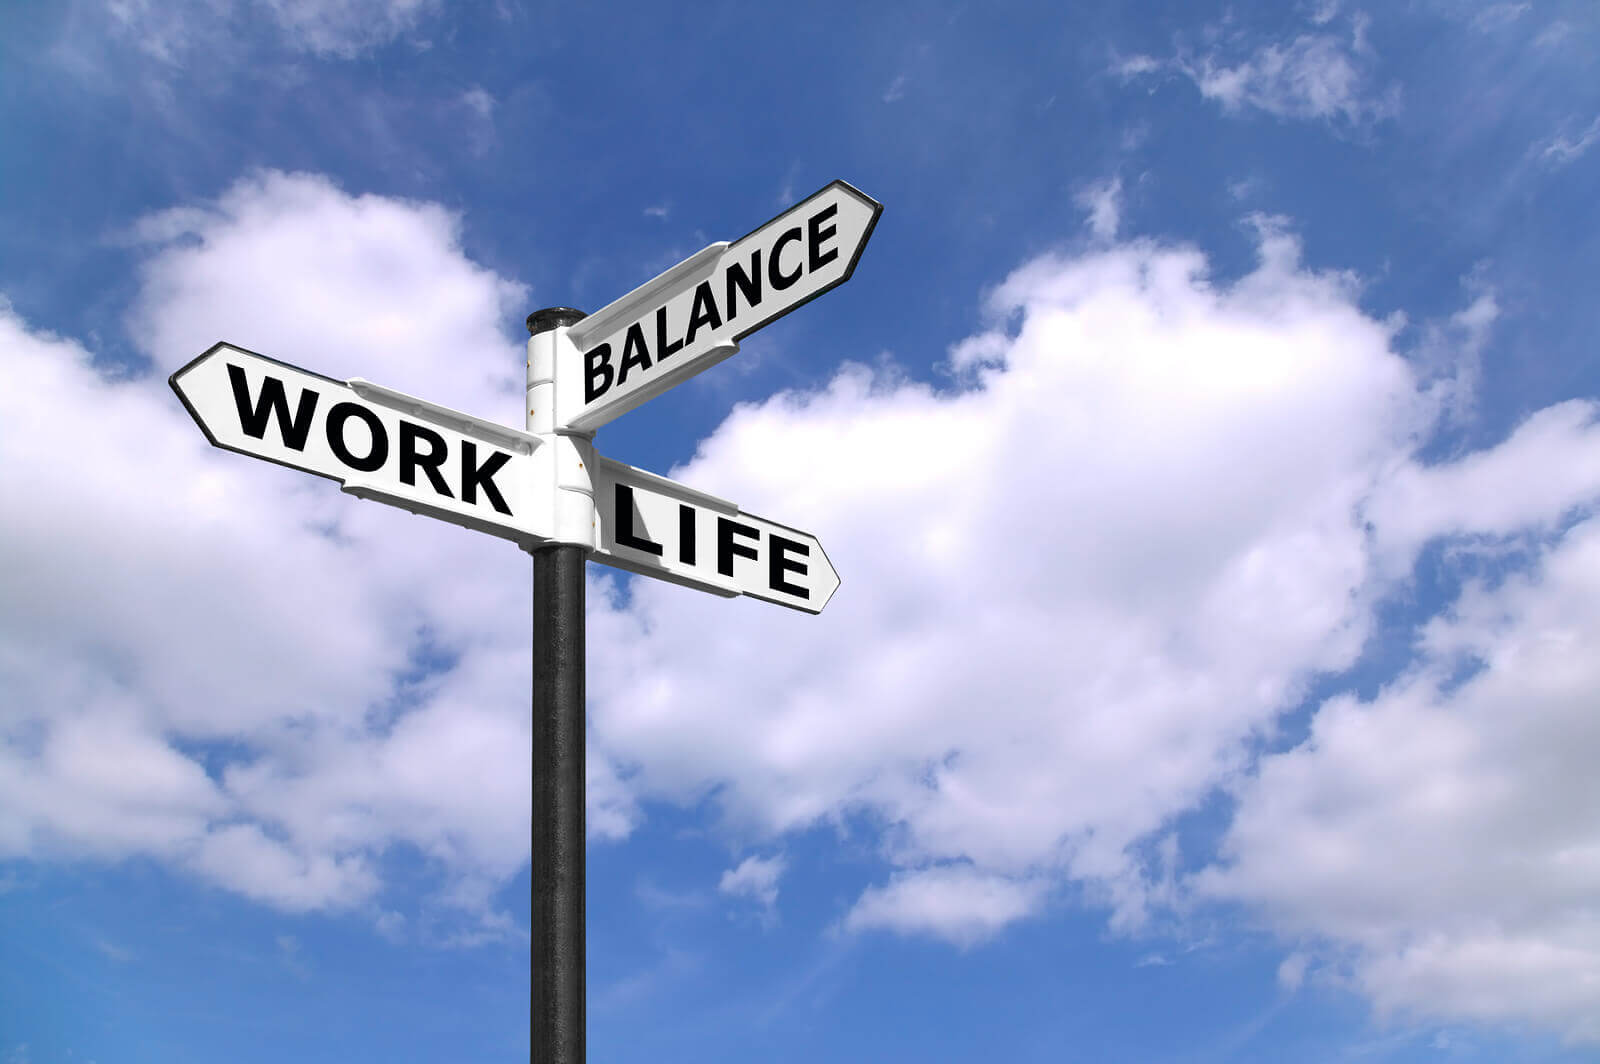 Great Ted Talks on Work-Life Balance